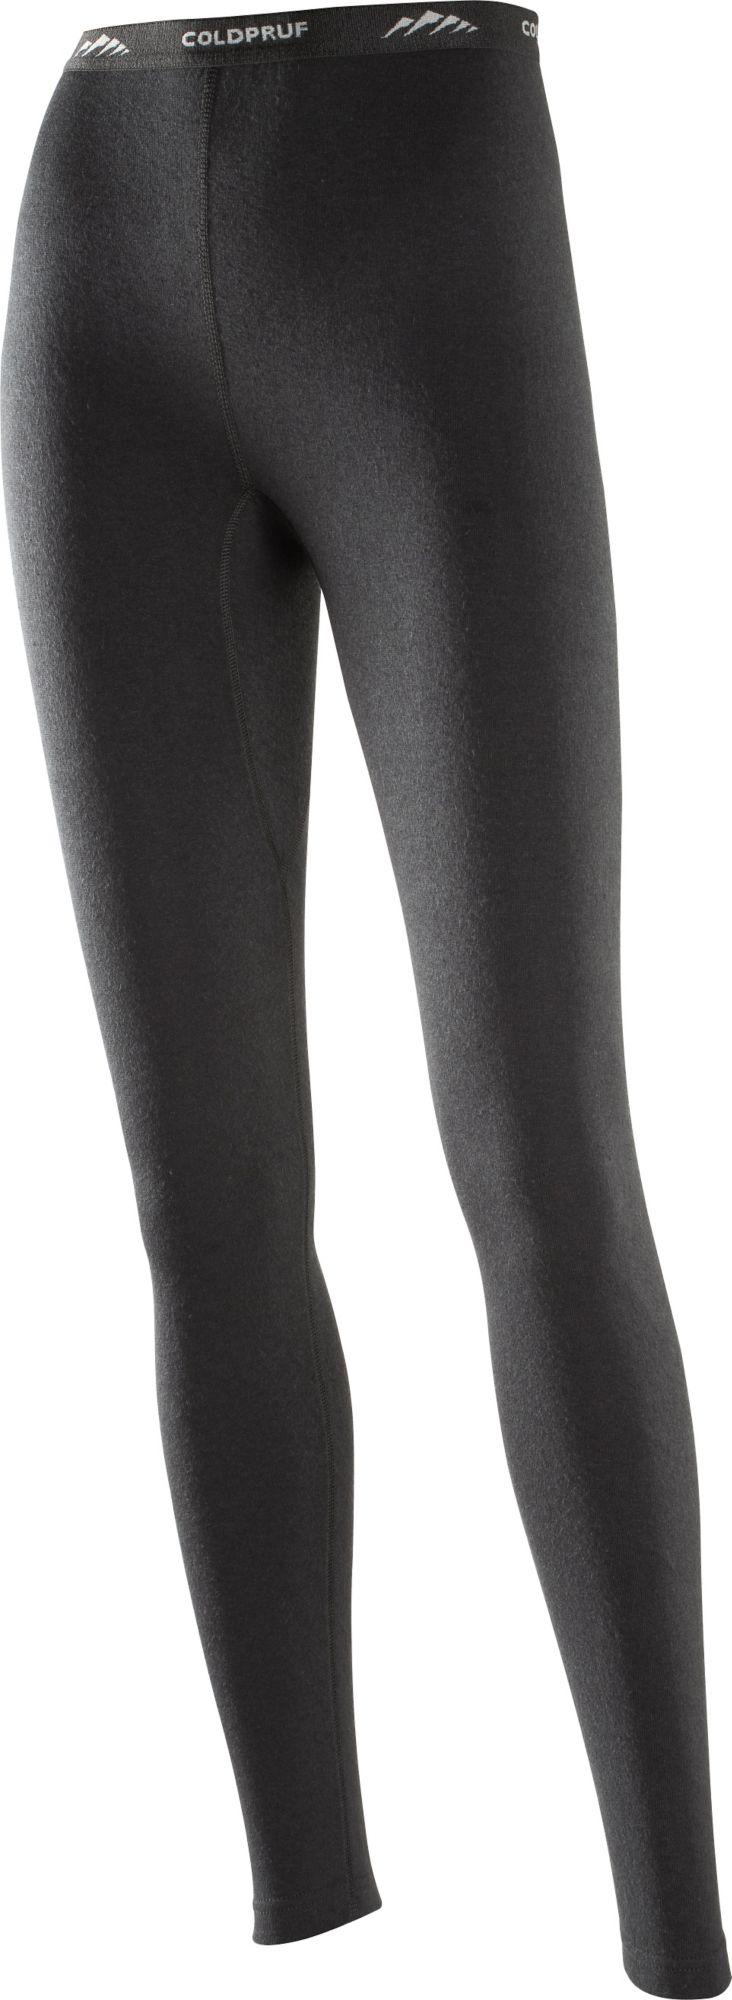 ColdPruf Women's Basic Base Layer Pants, Size: Small, Black thumbnail